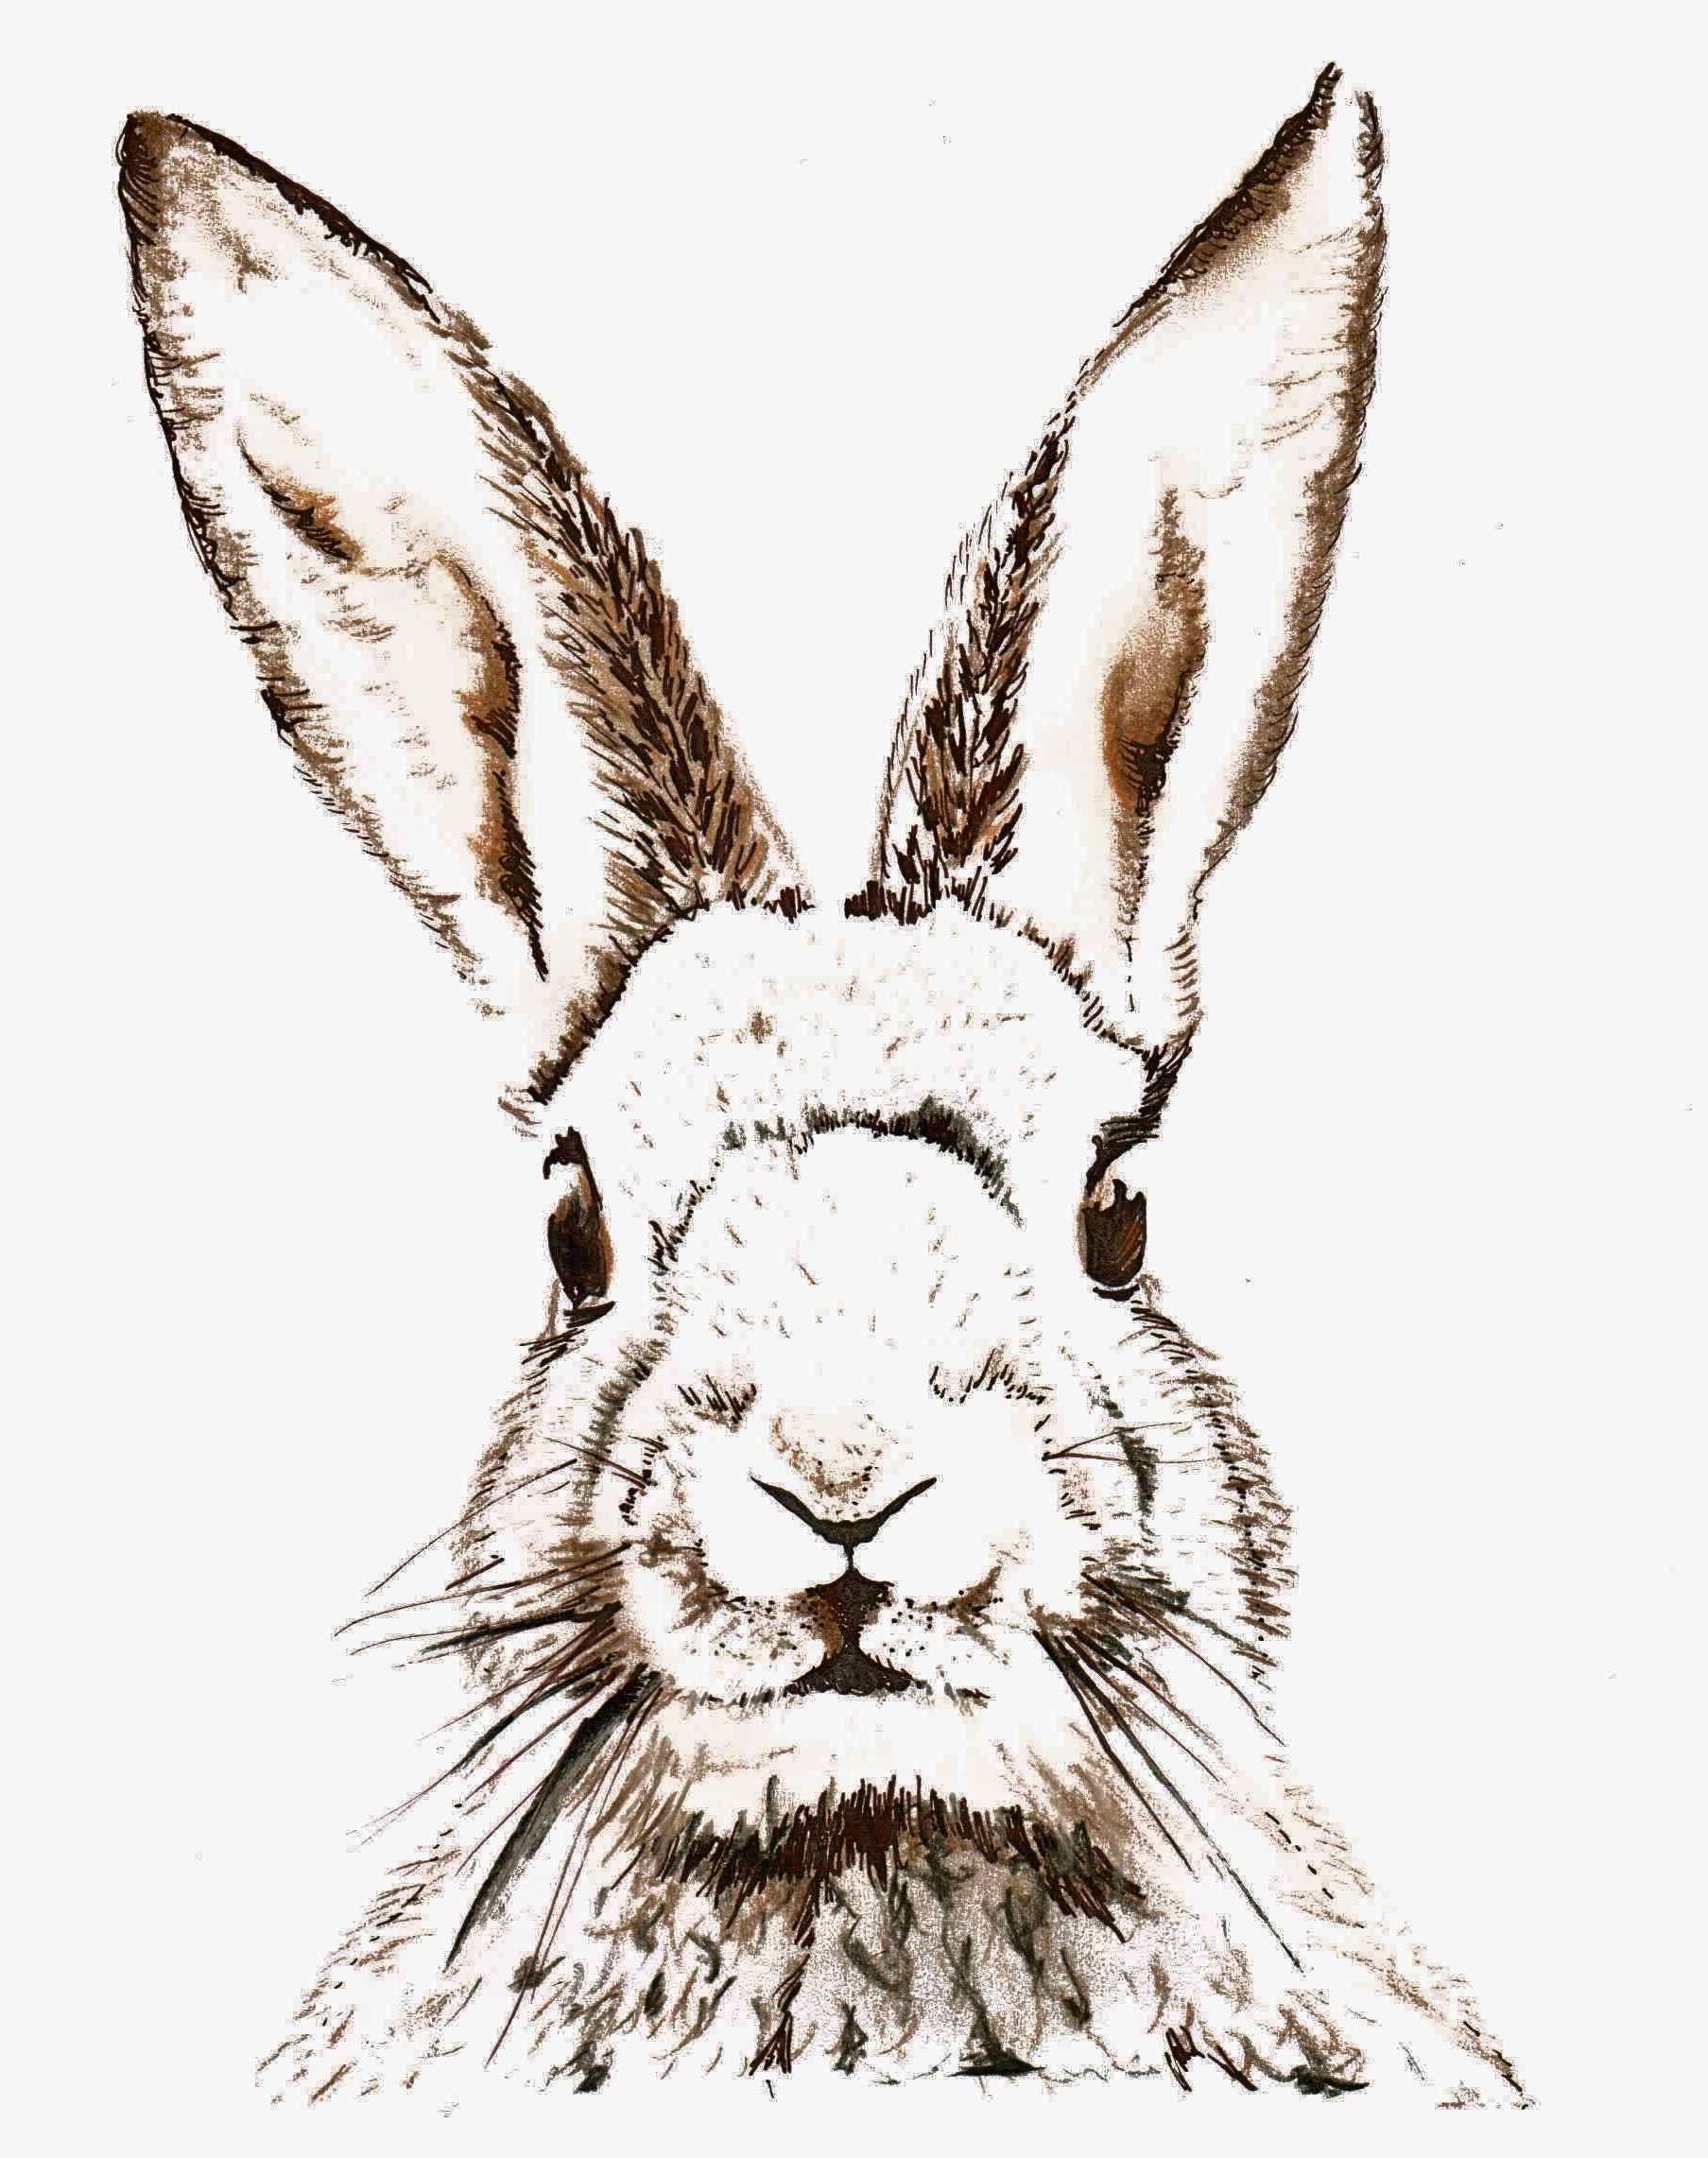 hight resolution of pink rabbit sketches free easter printable vintage clip art maggie holmes design